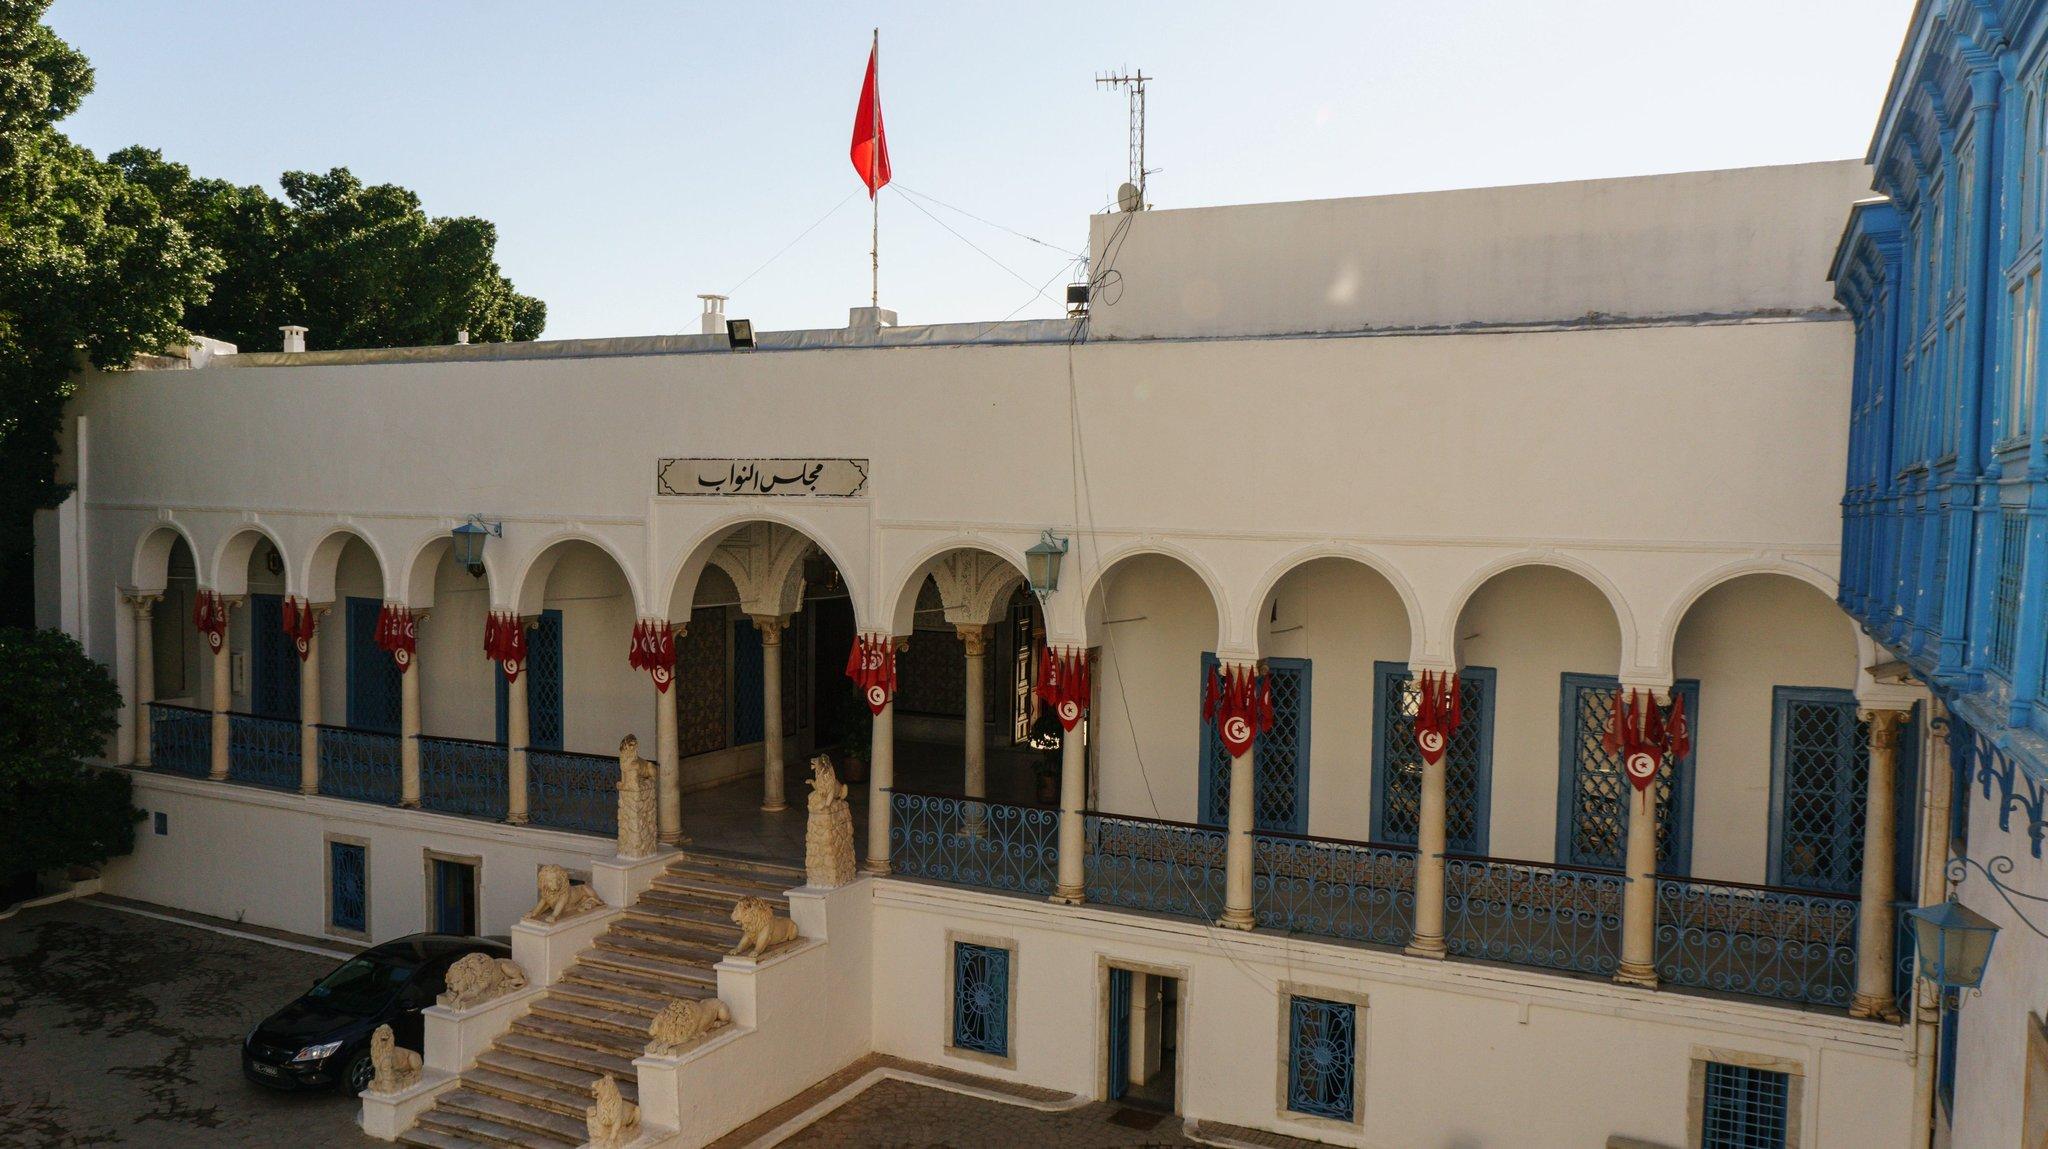 Фасад Тунисского парламента в крыле дворца Бардо